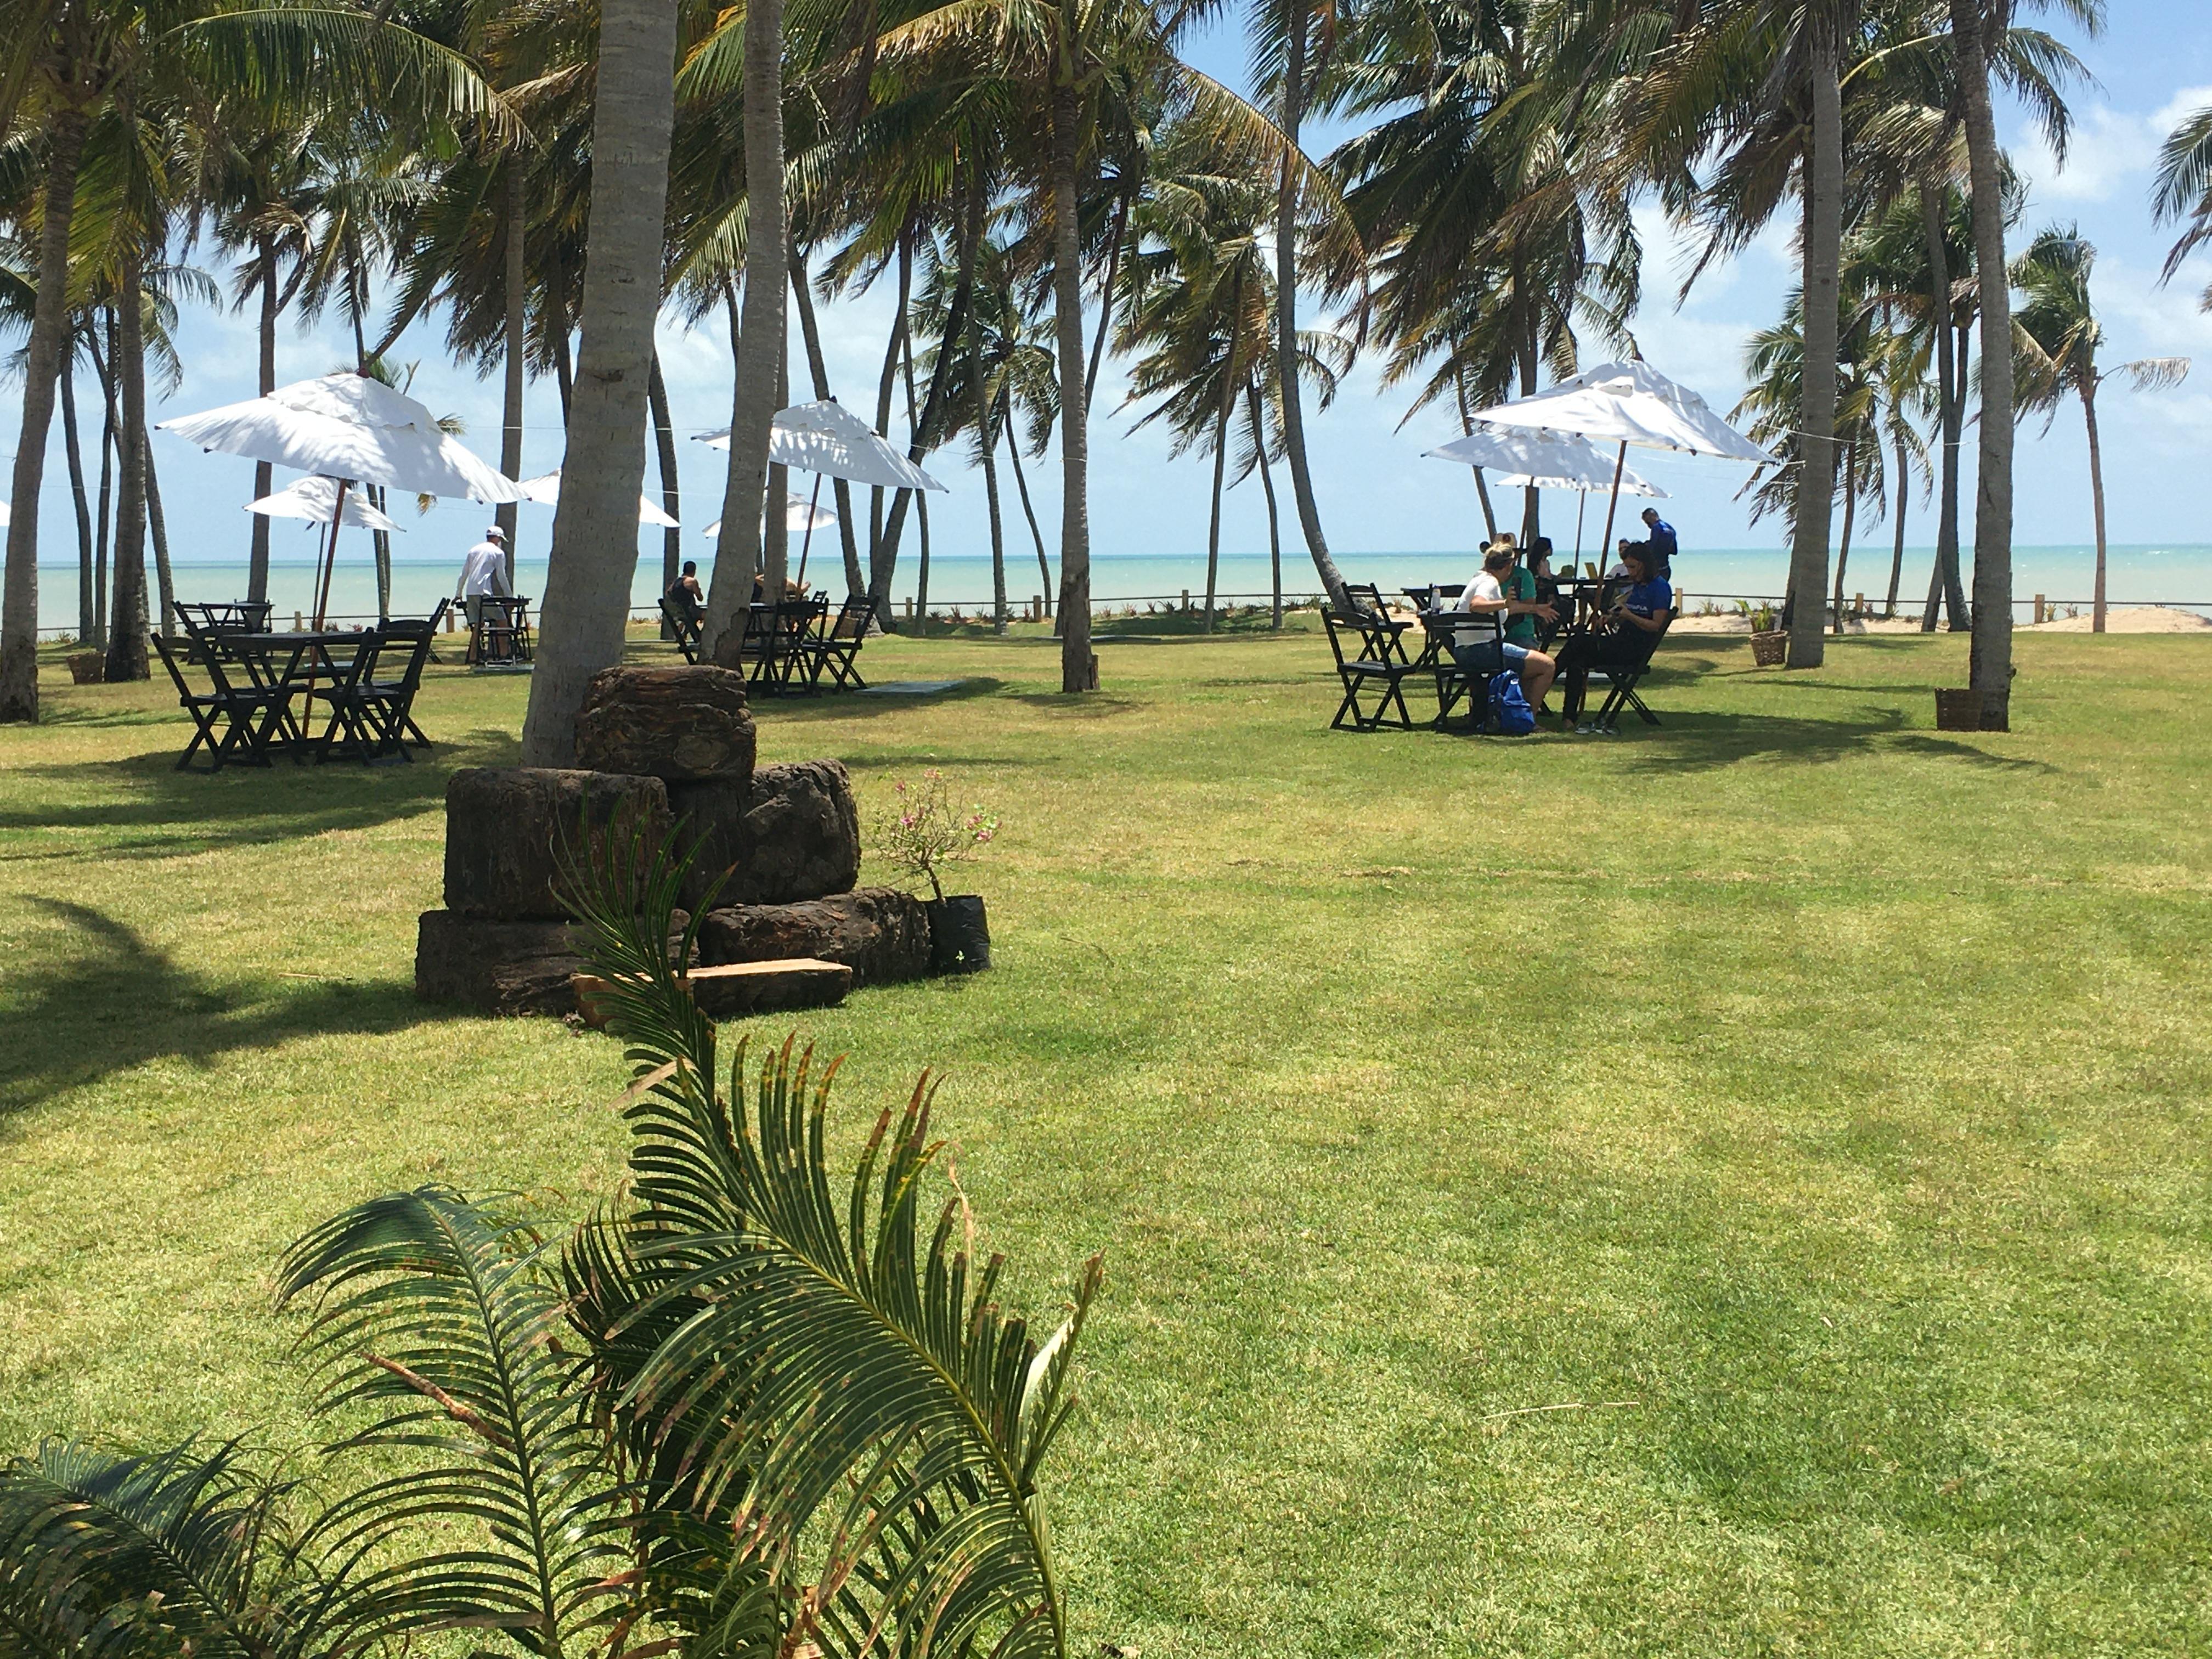 Ponto de Apoio na Praia | Maracajaú Diver